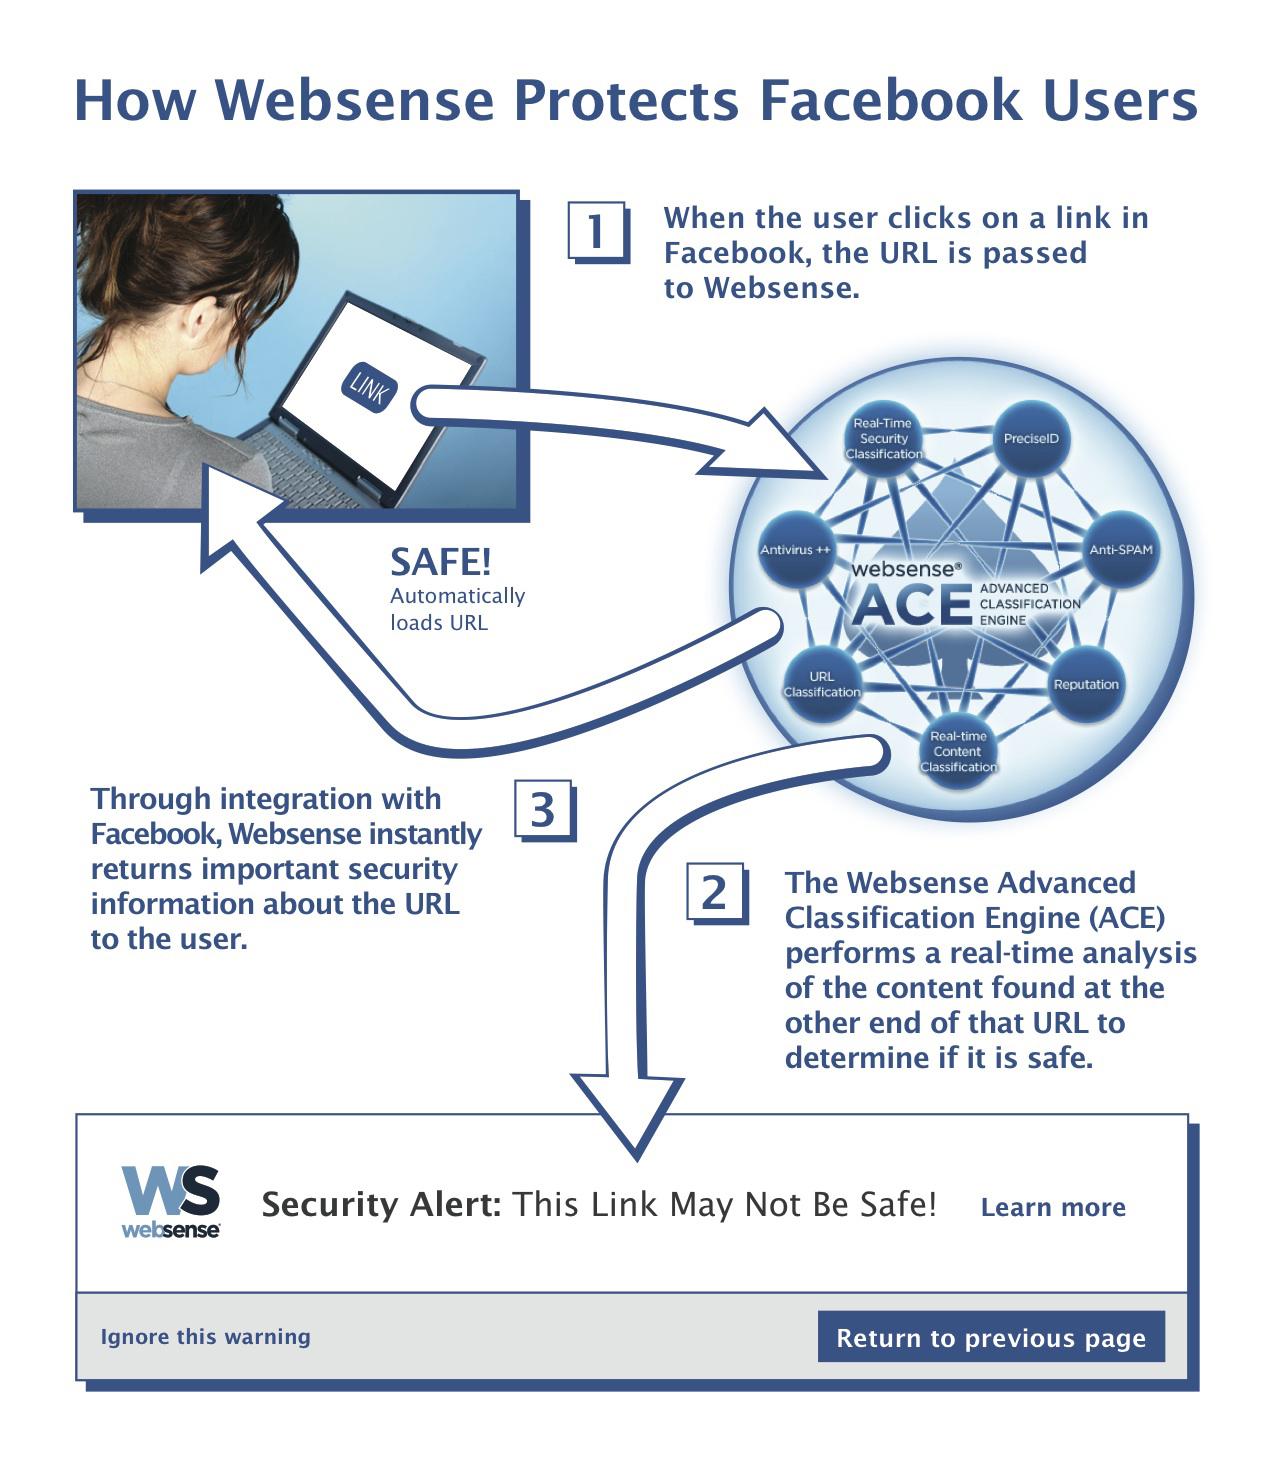 Websense-Facebook Infographic